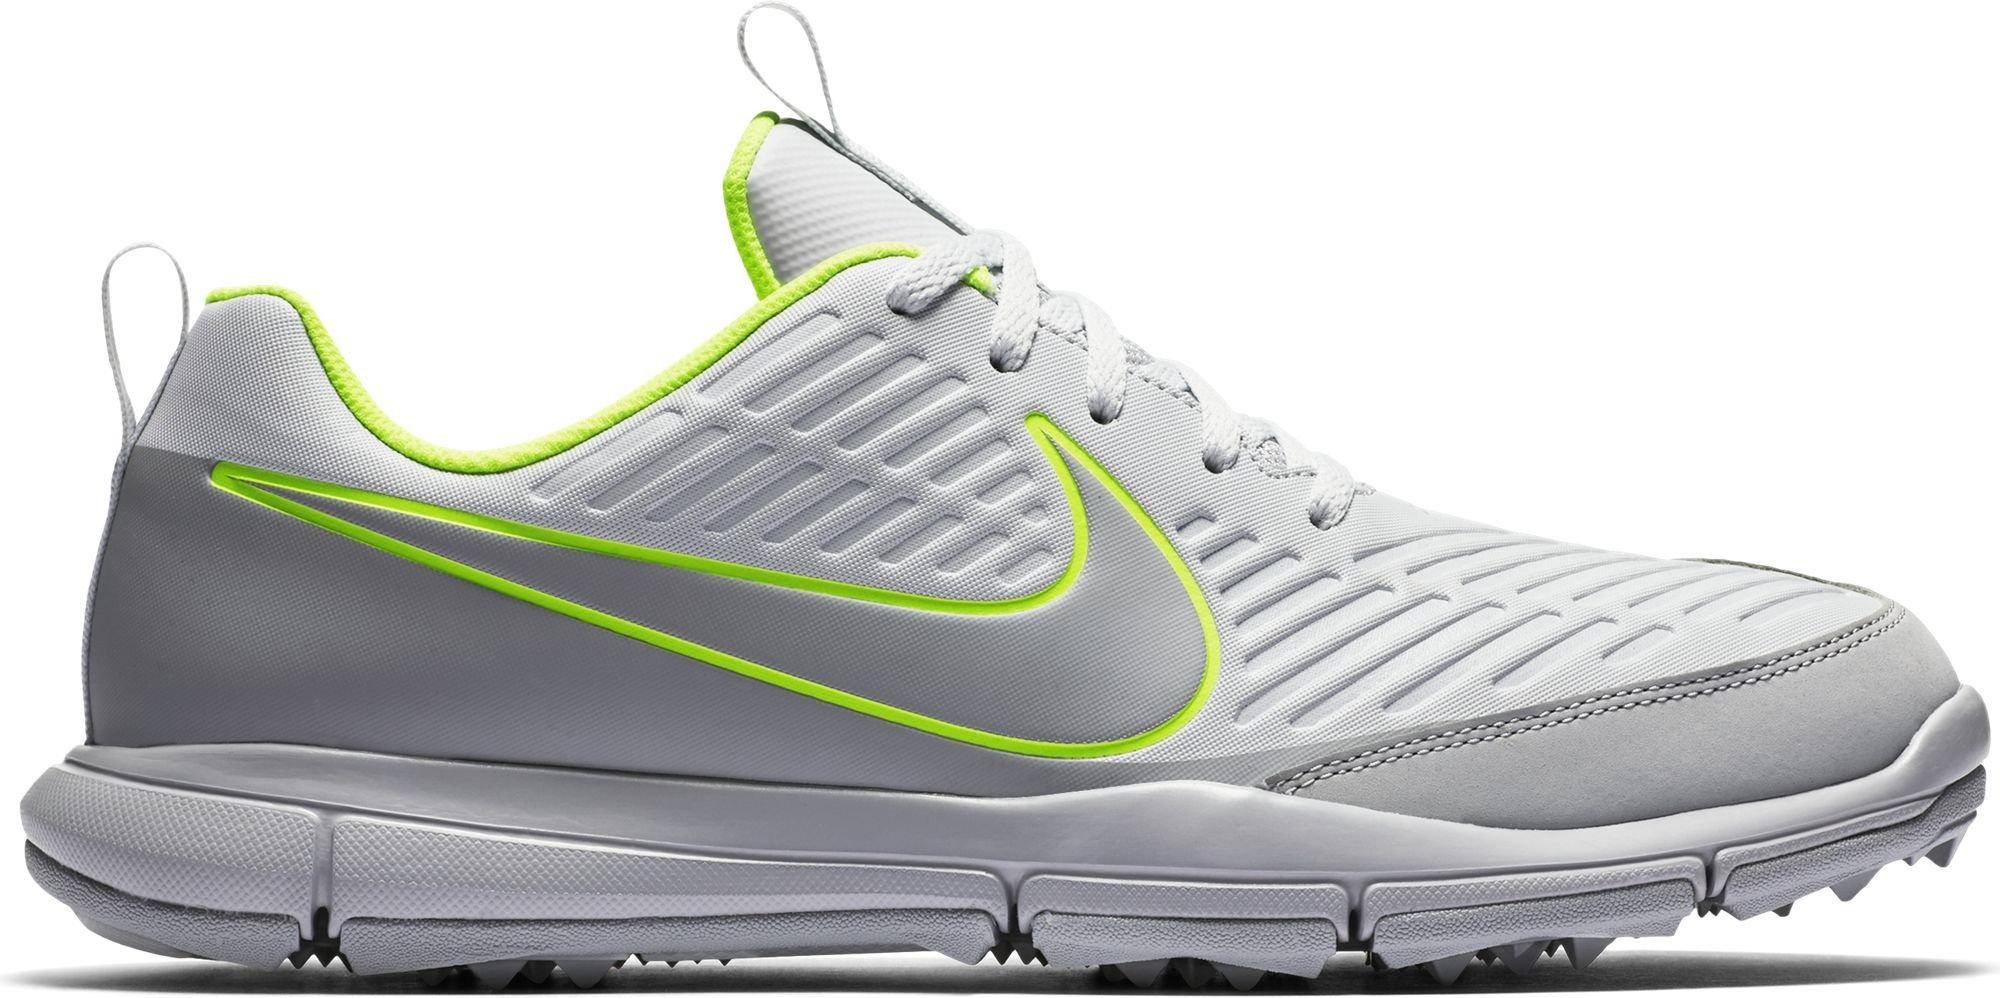 NIKE Explorer 2 Mens Golf Shoes (11 D(M) US)